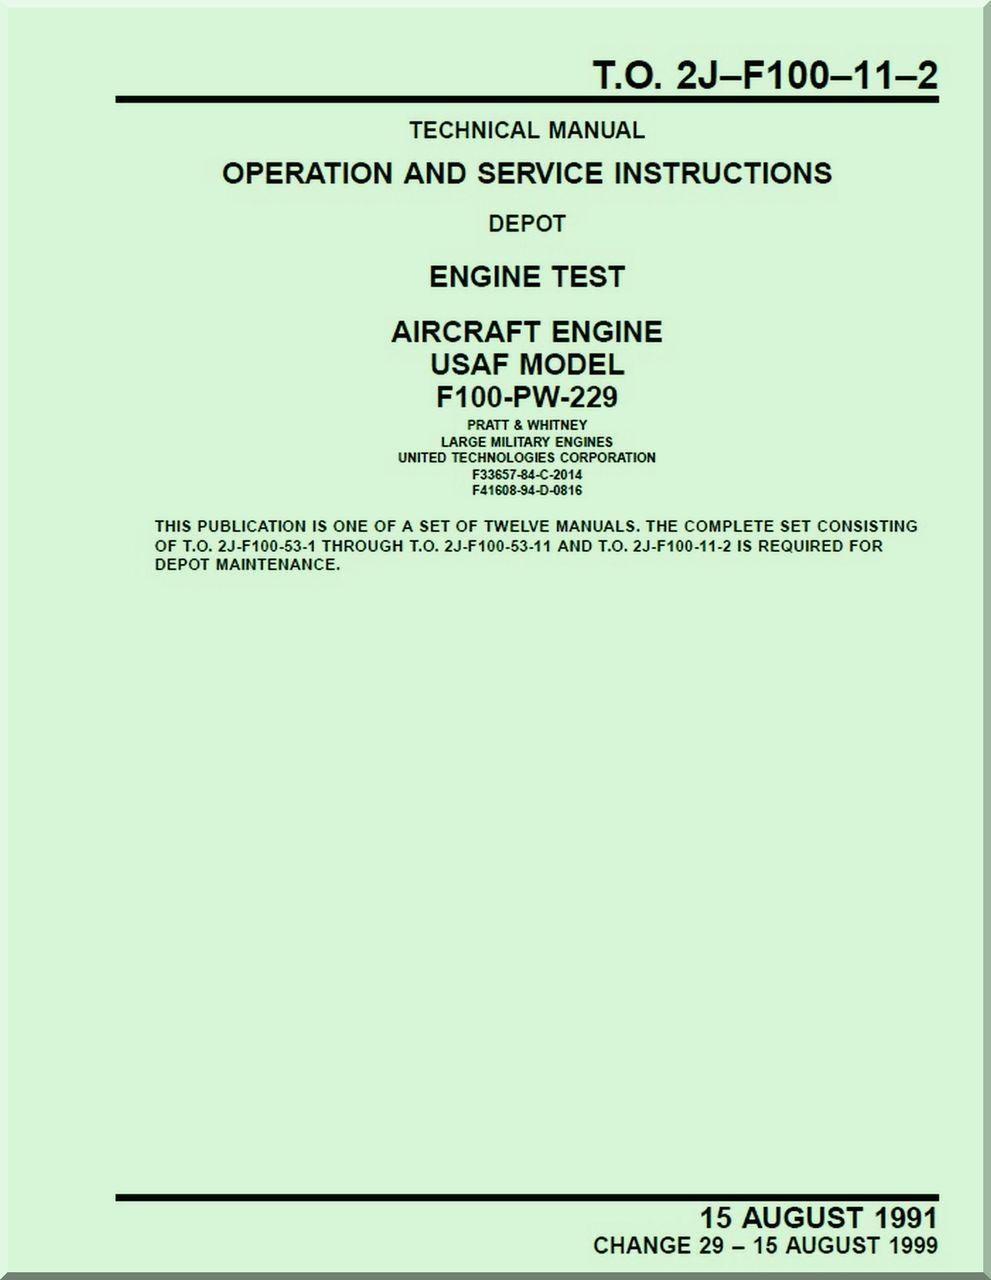 pratt whitney f100 pw 229 aircraft engines operation and service rh pinterest com B-58 Aircraft F100 Aircraft Engine